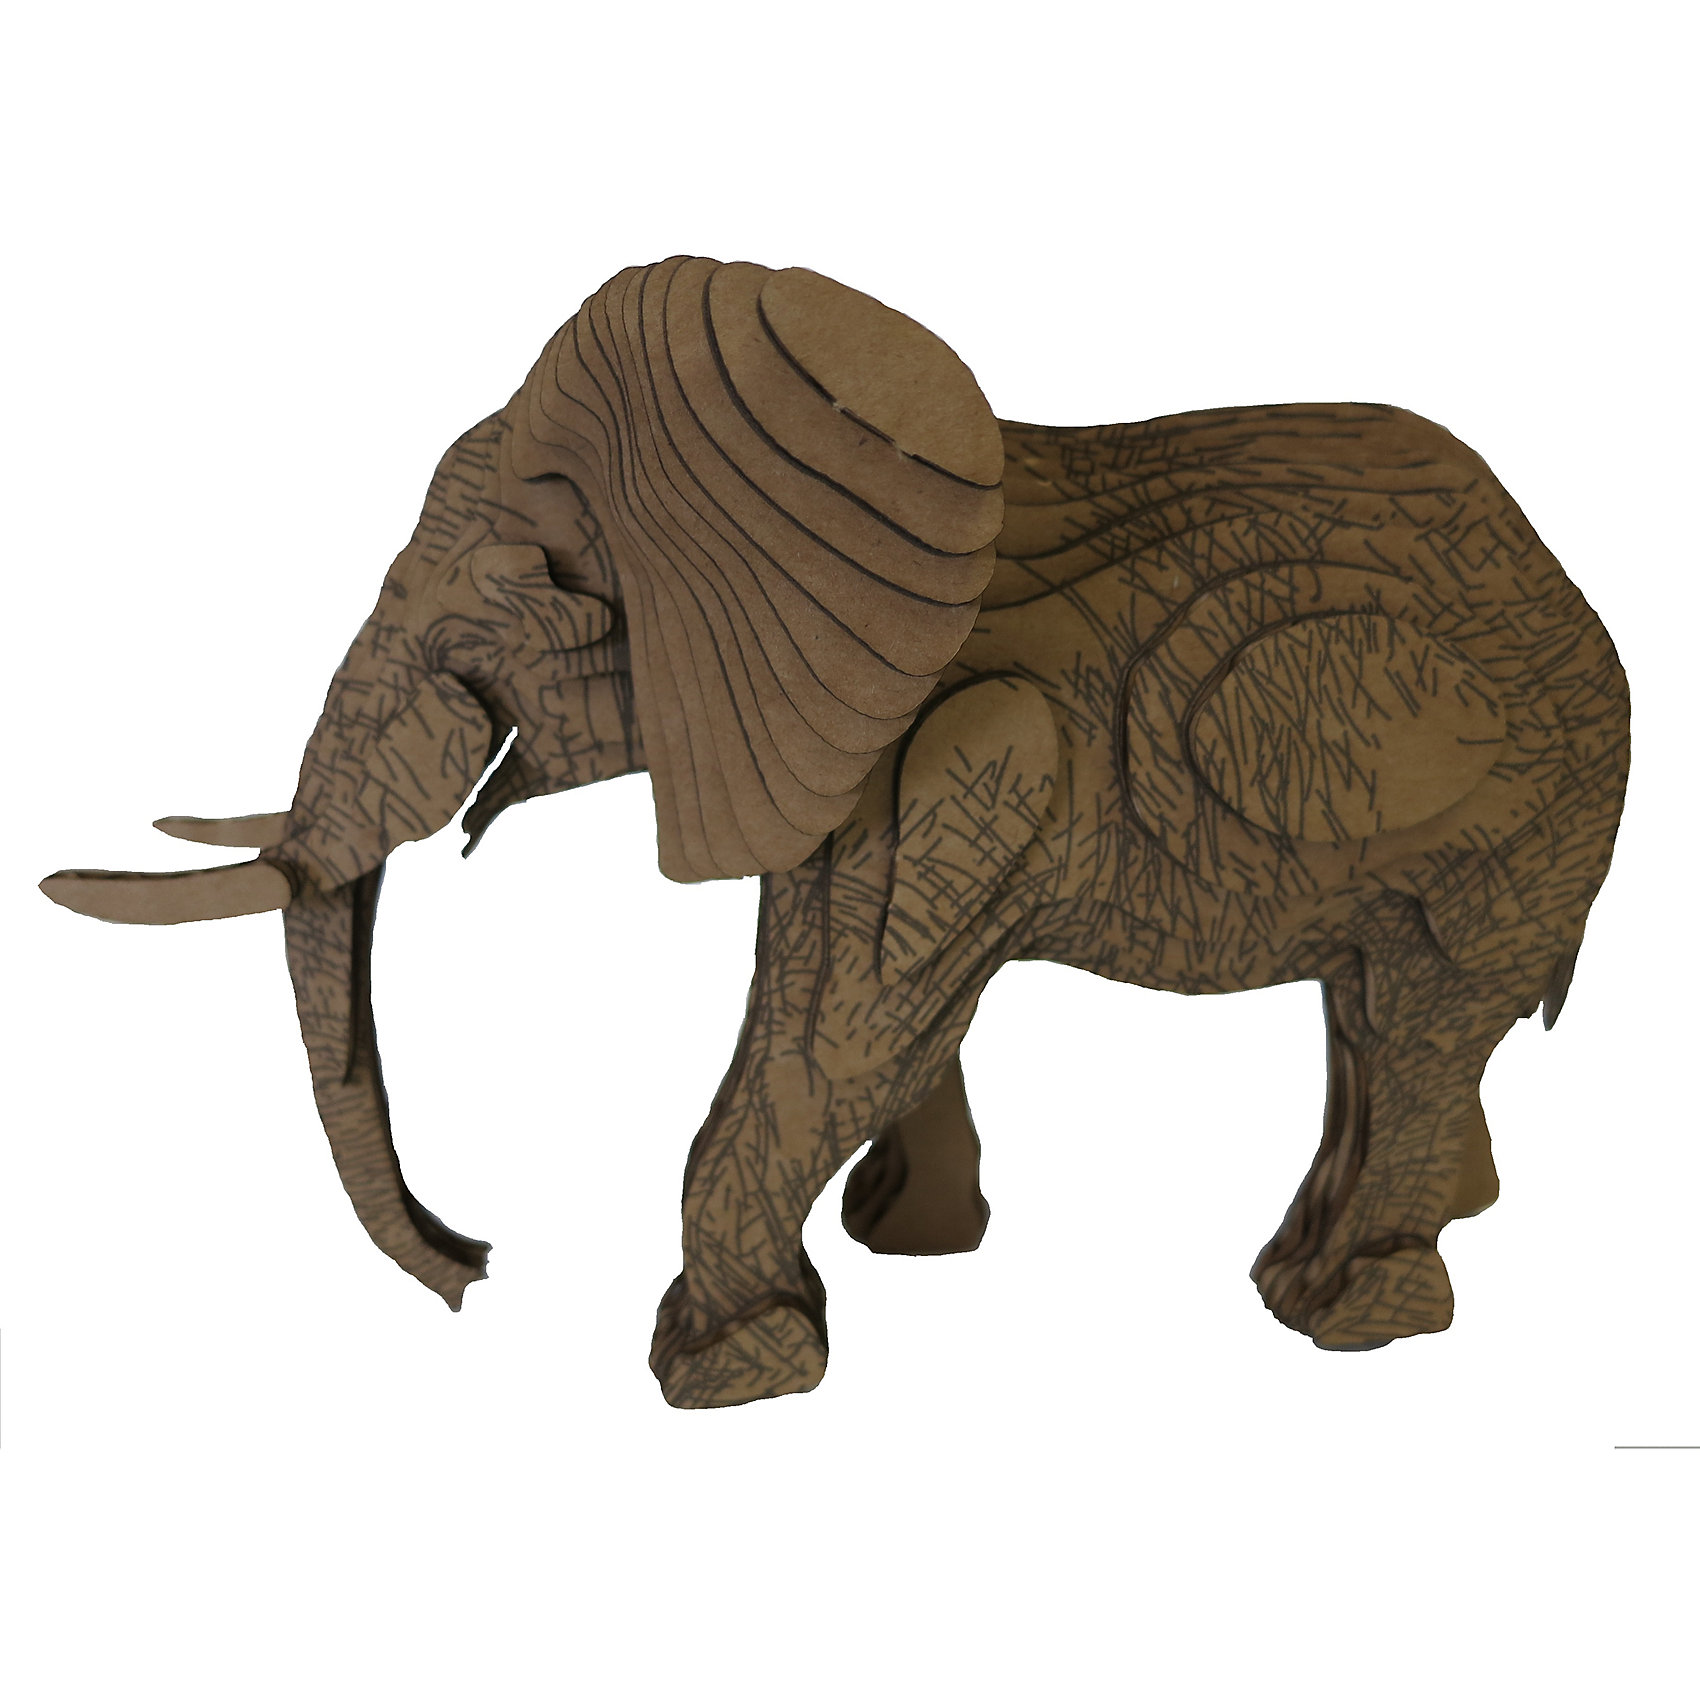 3D-Пазл «Слон», PandaPuzzle